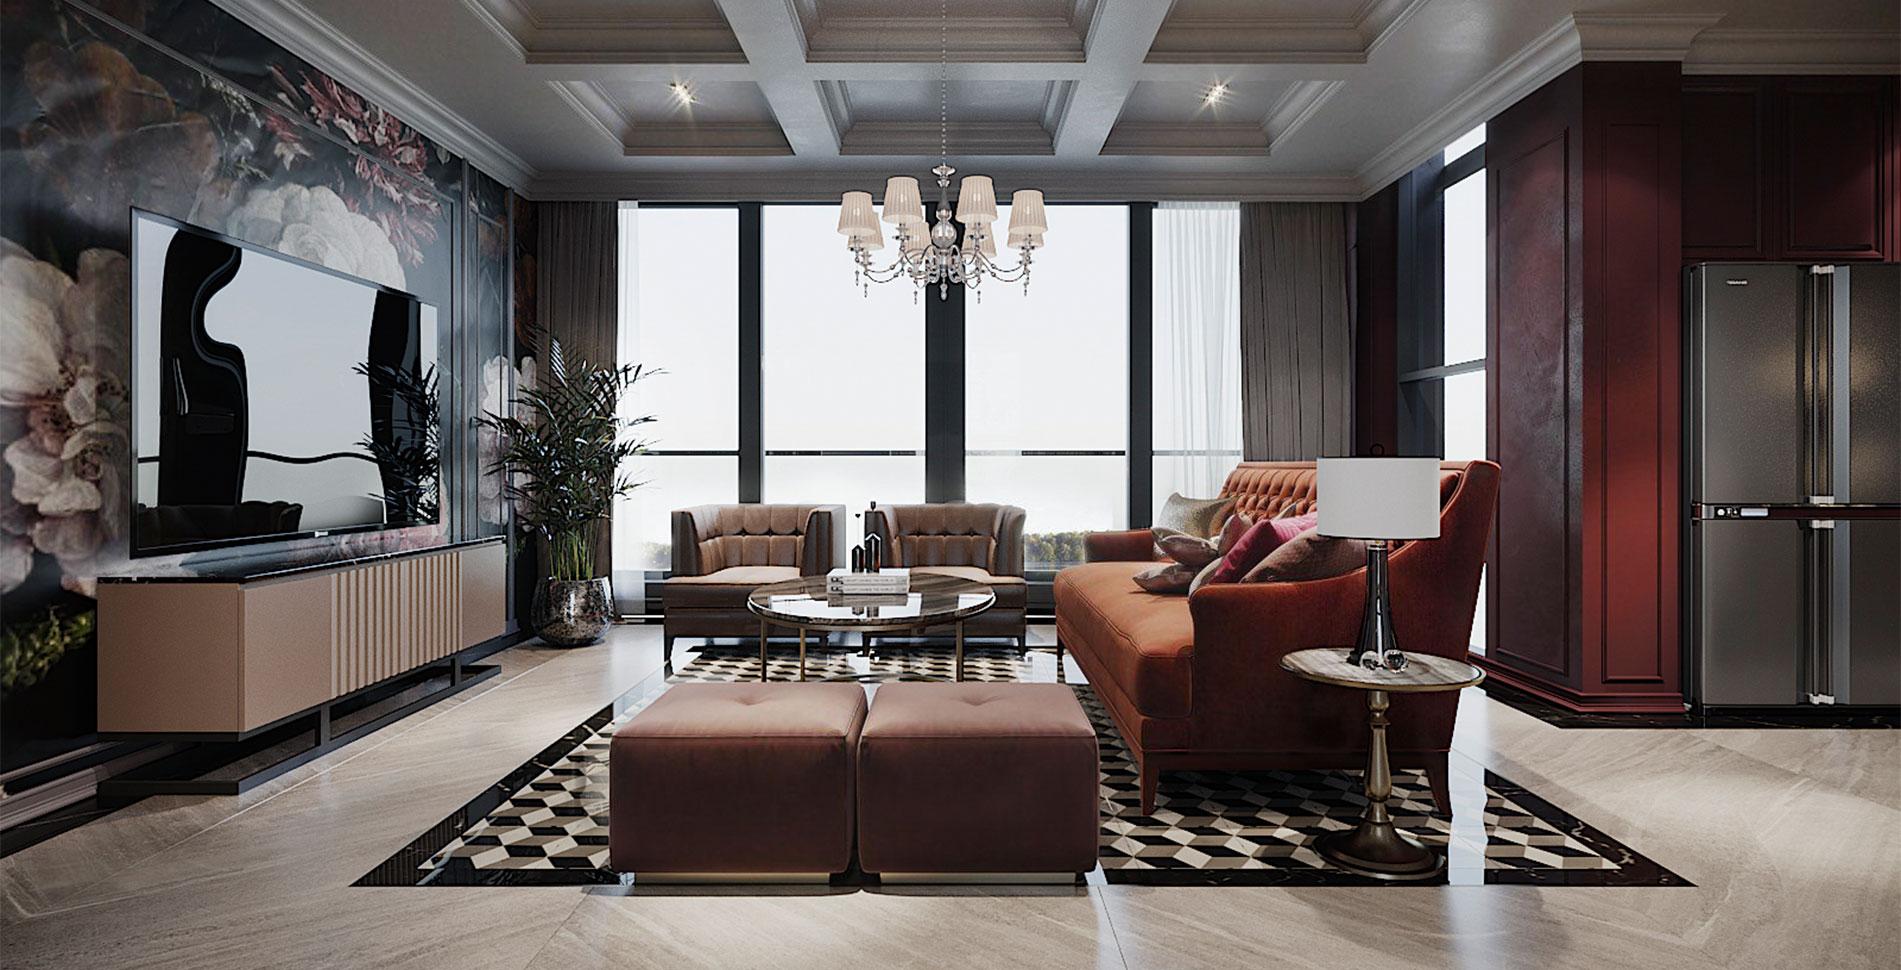 Thiết kế căn hộ Panomax River Villa